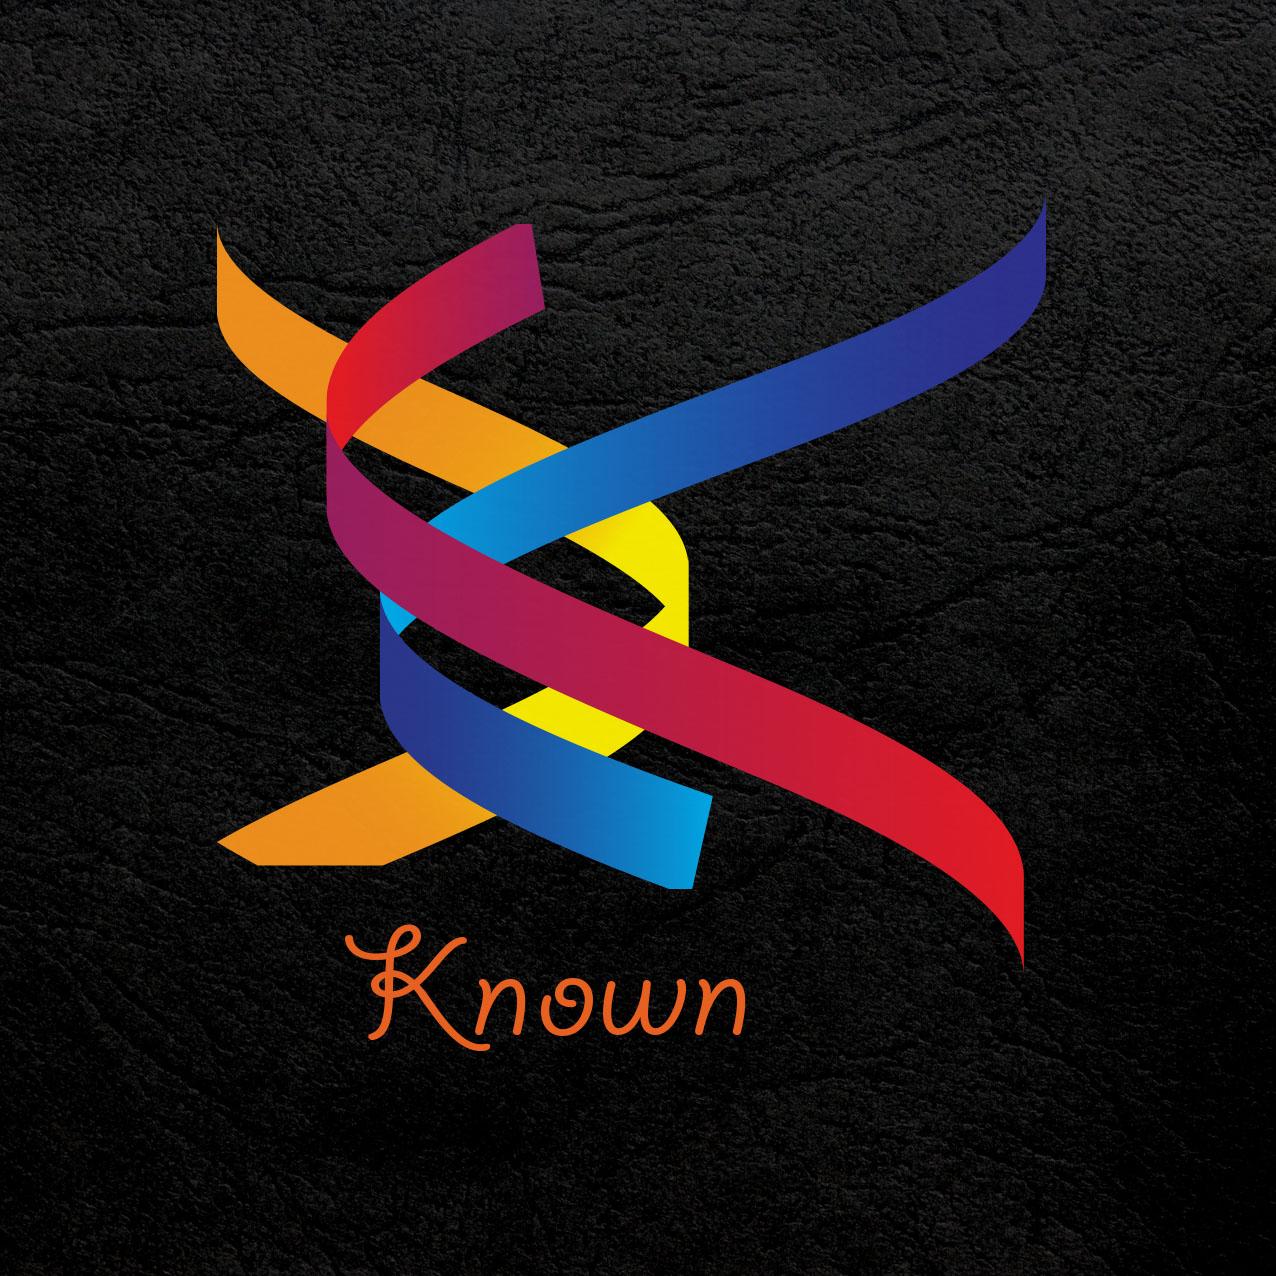 Design eye-catching creative logo